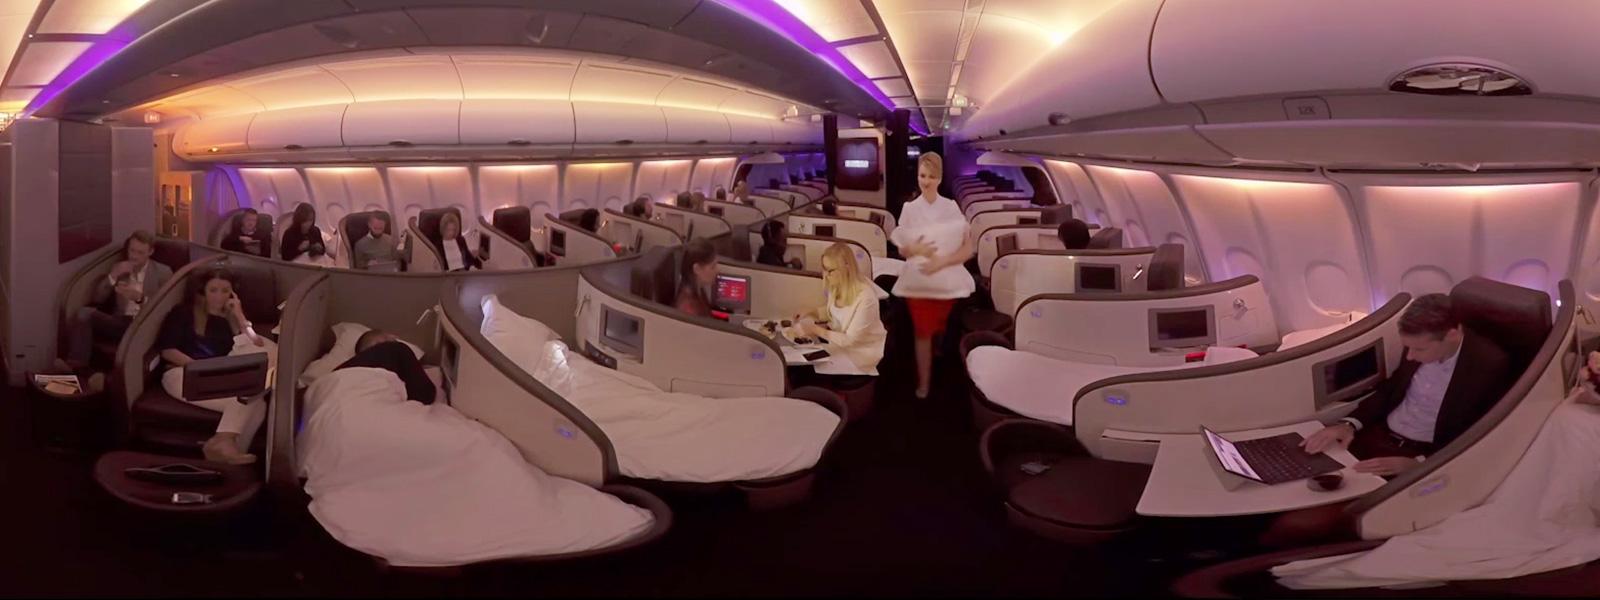 Two passengers on a Virgin Atlantic flight, using touchscreen on headrest